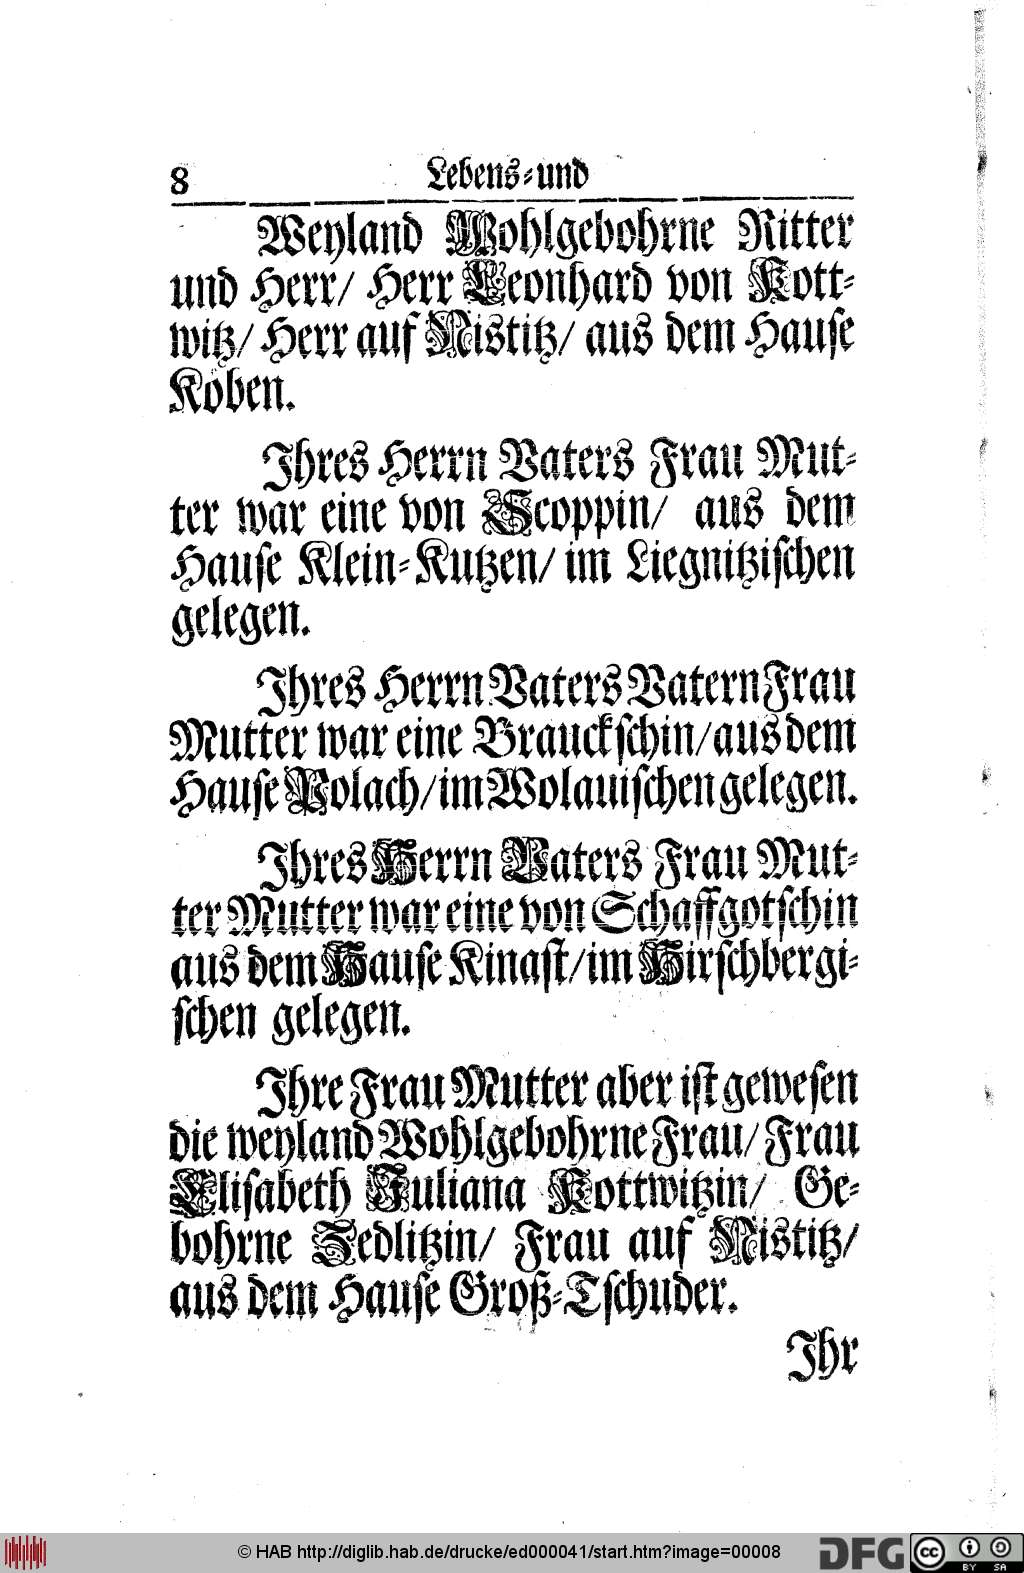 http://diglib.hab.de/drucke/ed000041/00008.jpg